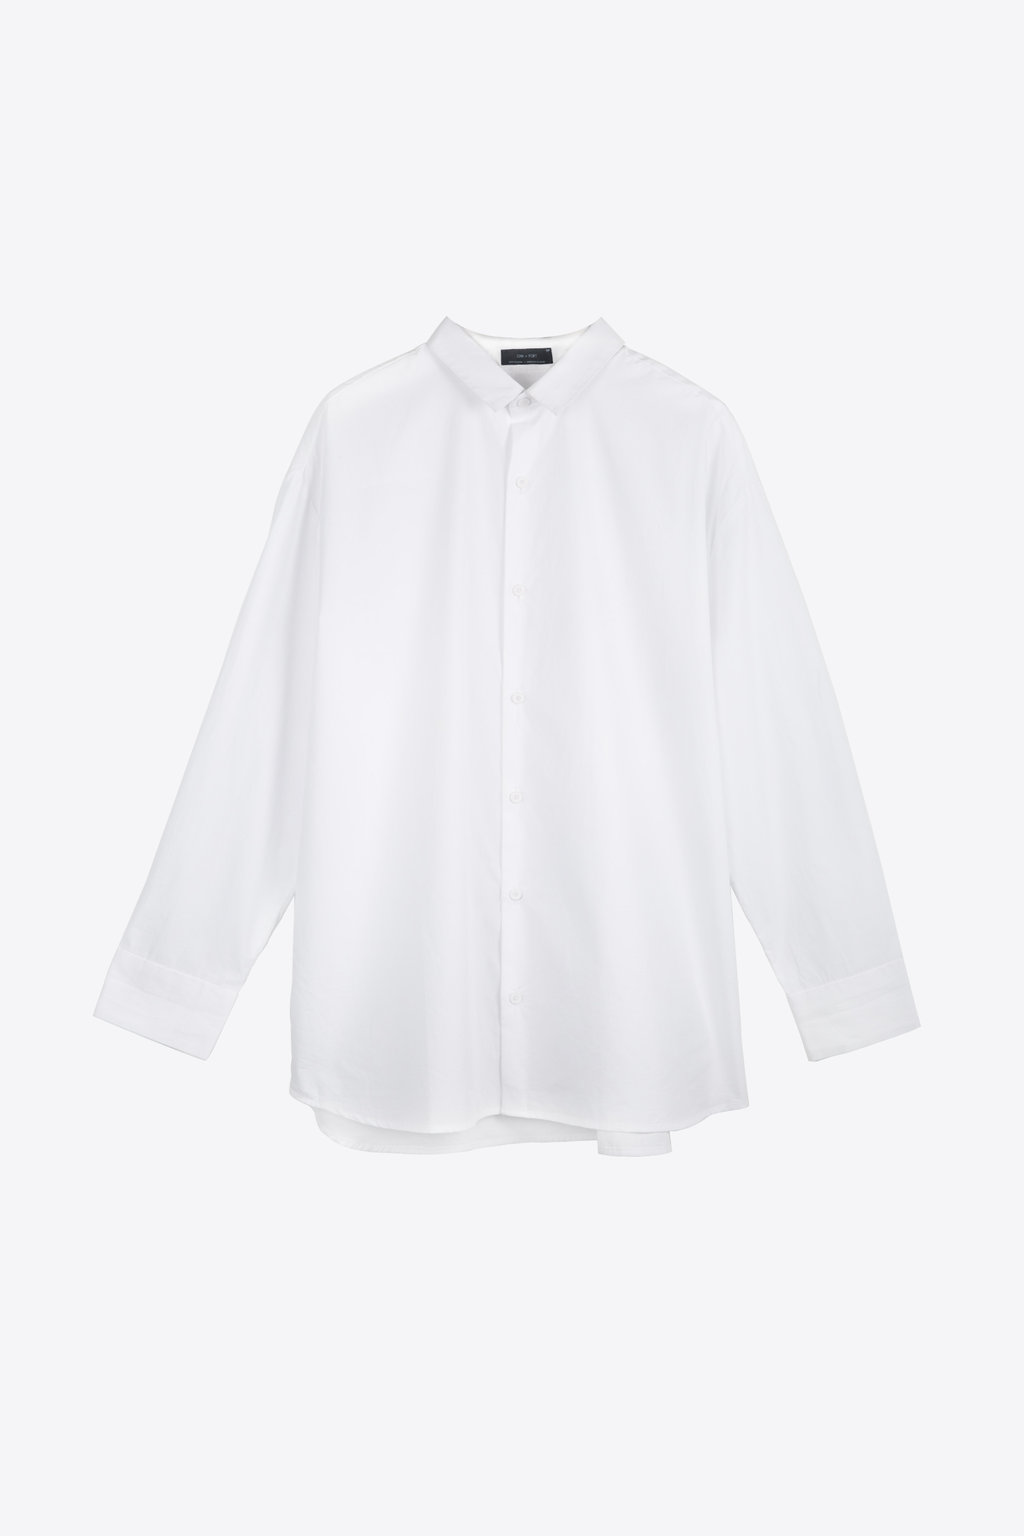 Shirt 1417 White 4